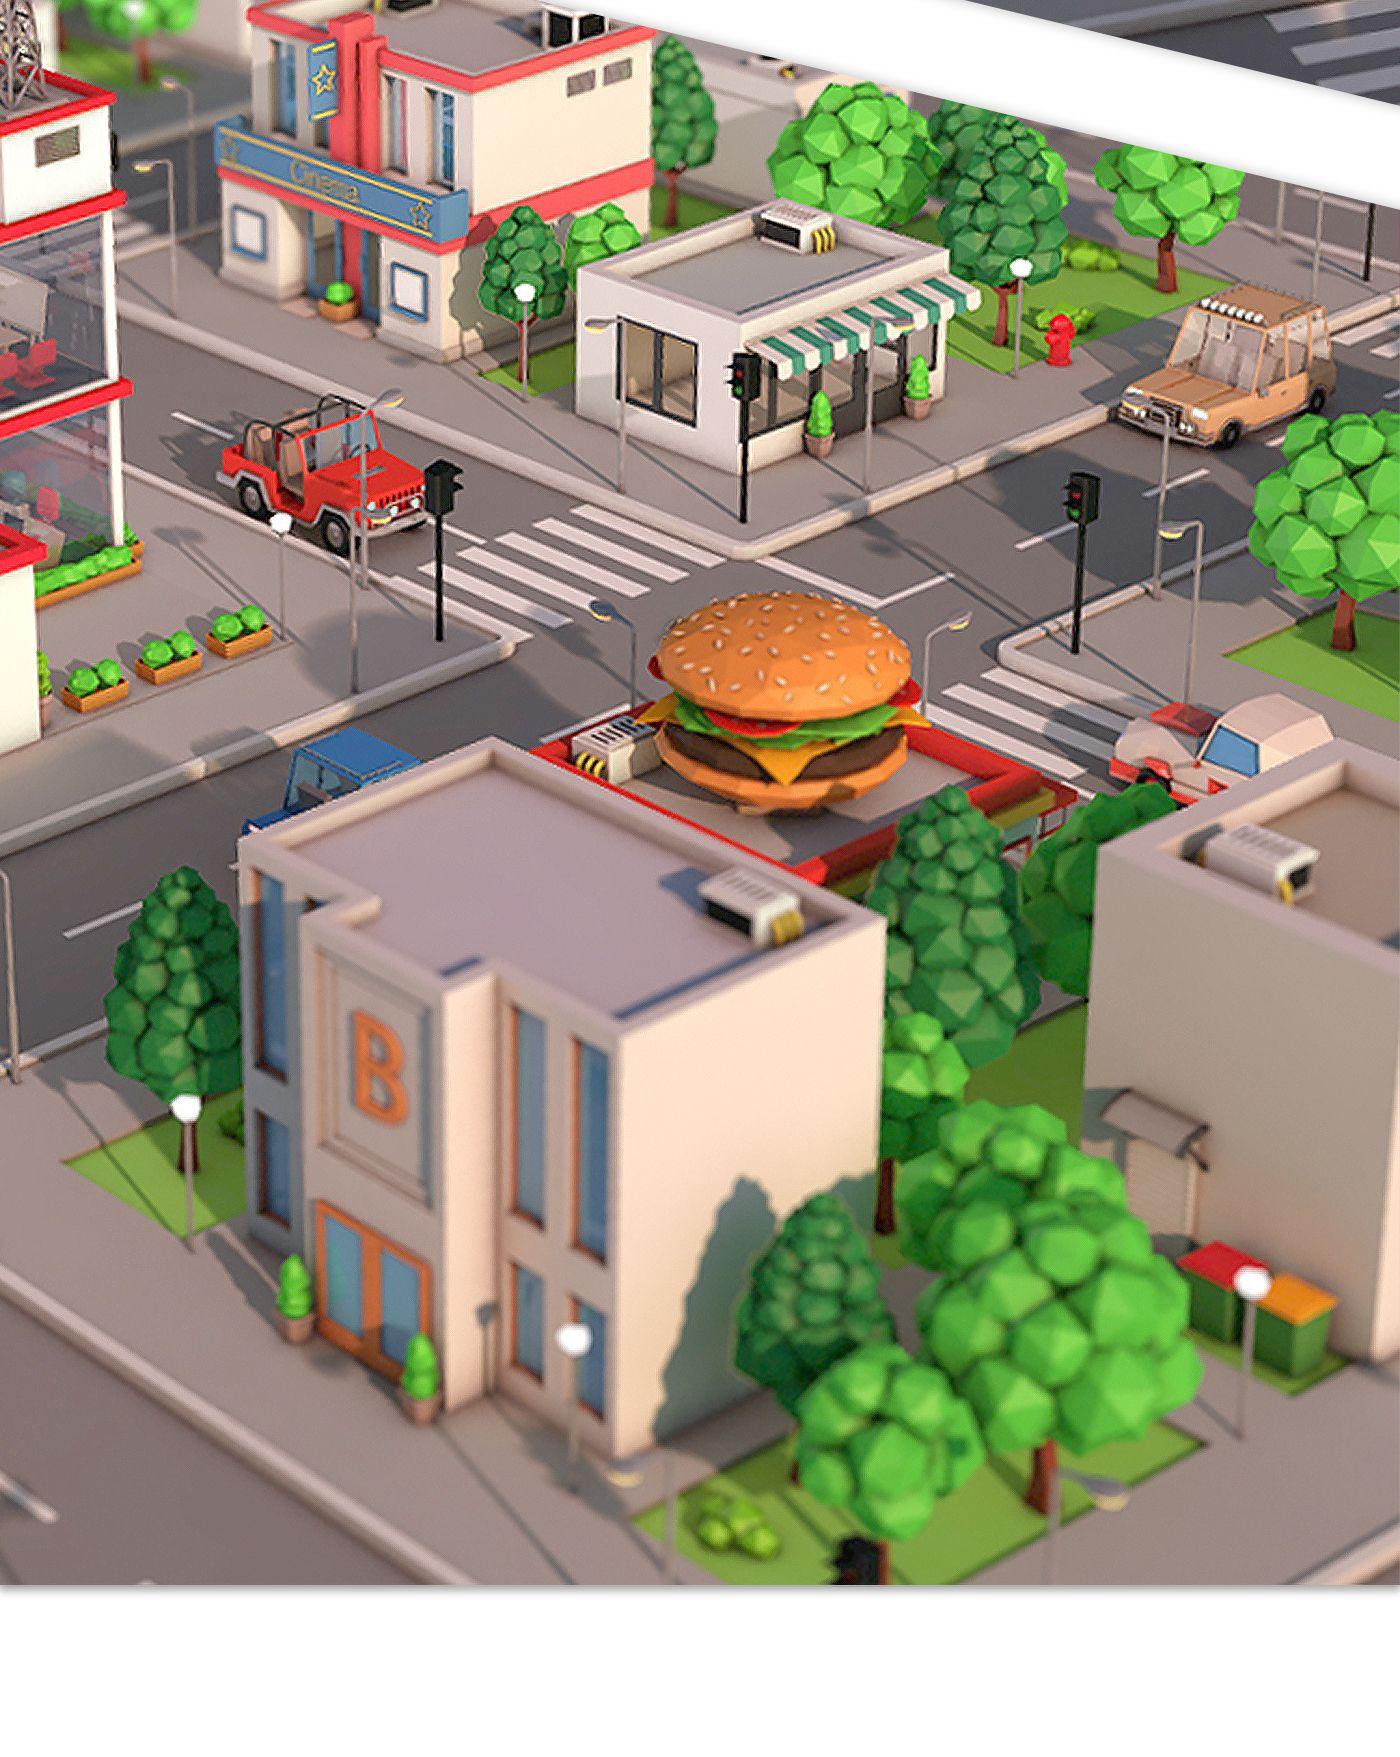 Low Poly City Pack Download 3D Model Formats max, maya